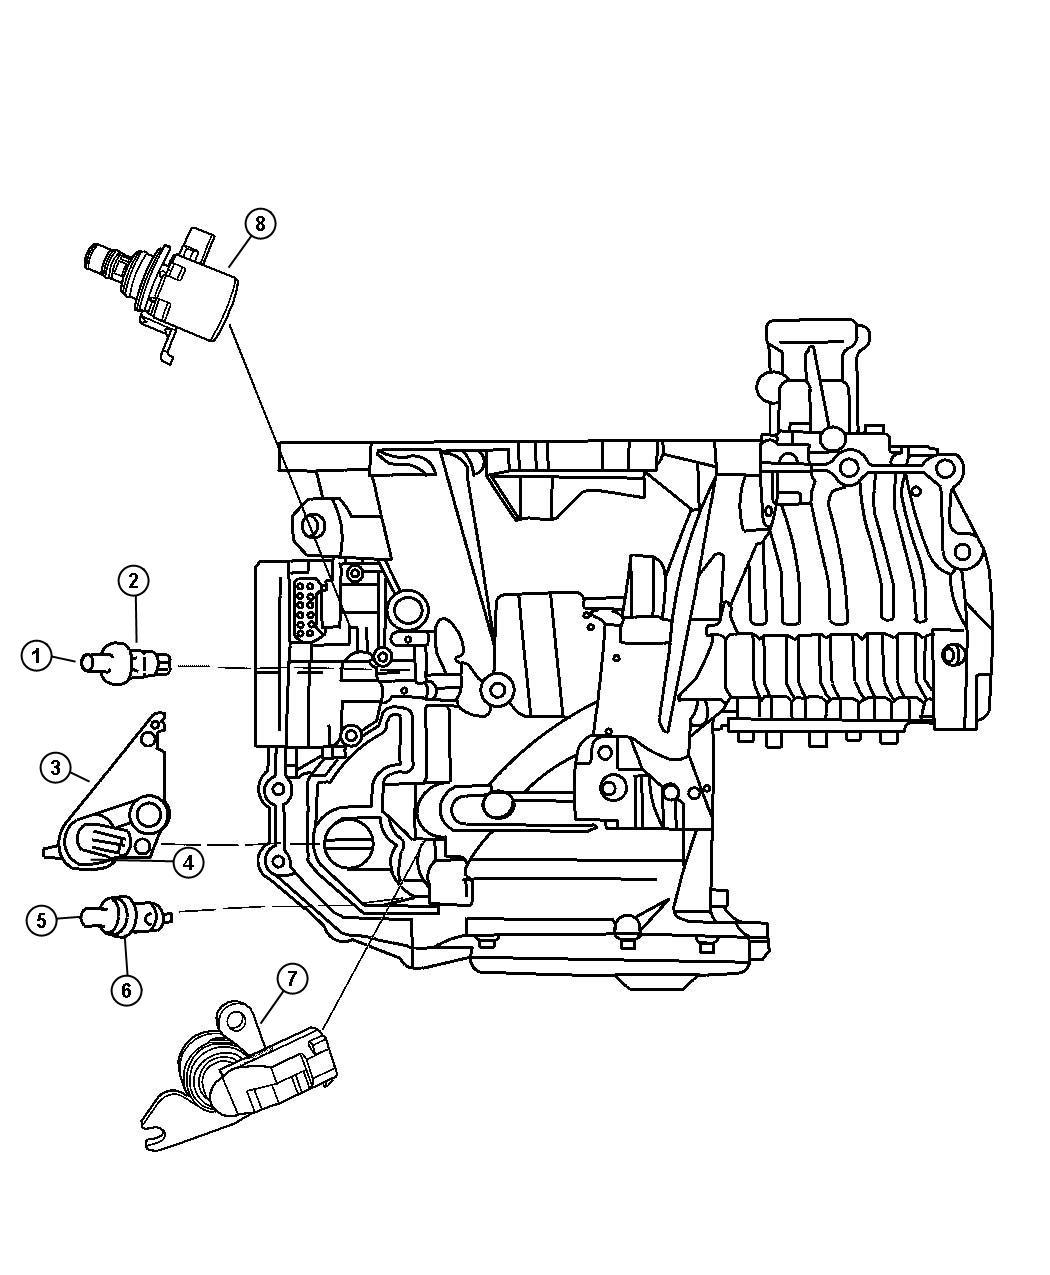 2007 Chrysler Pacifica Sensor, solenoid. Trans variable